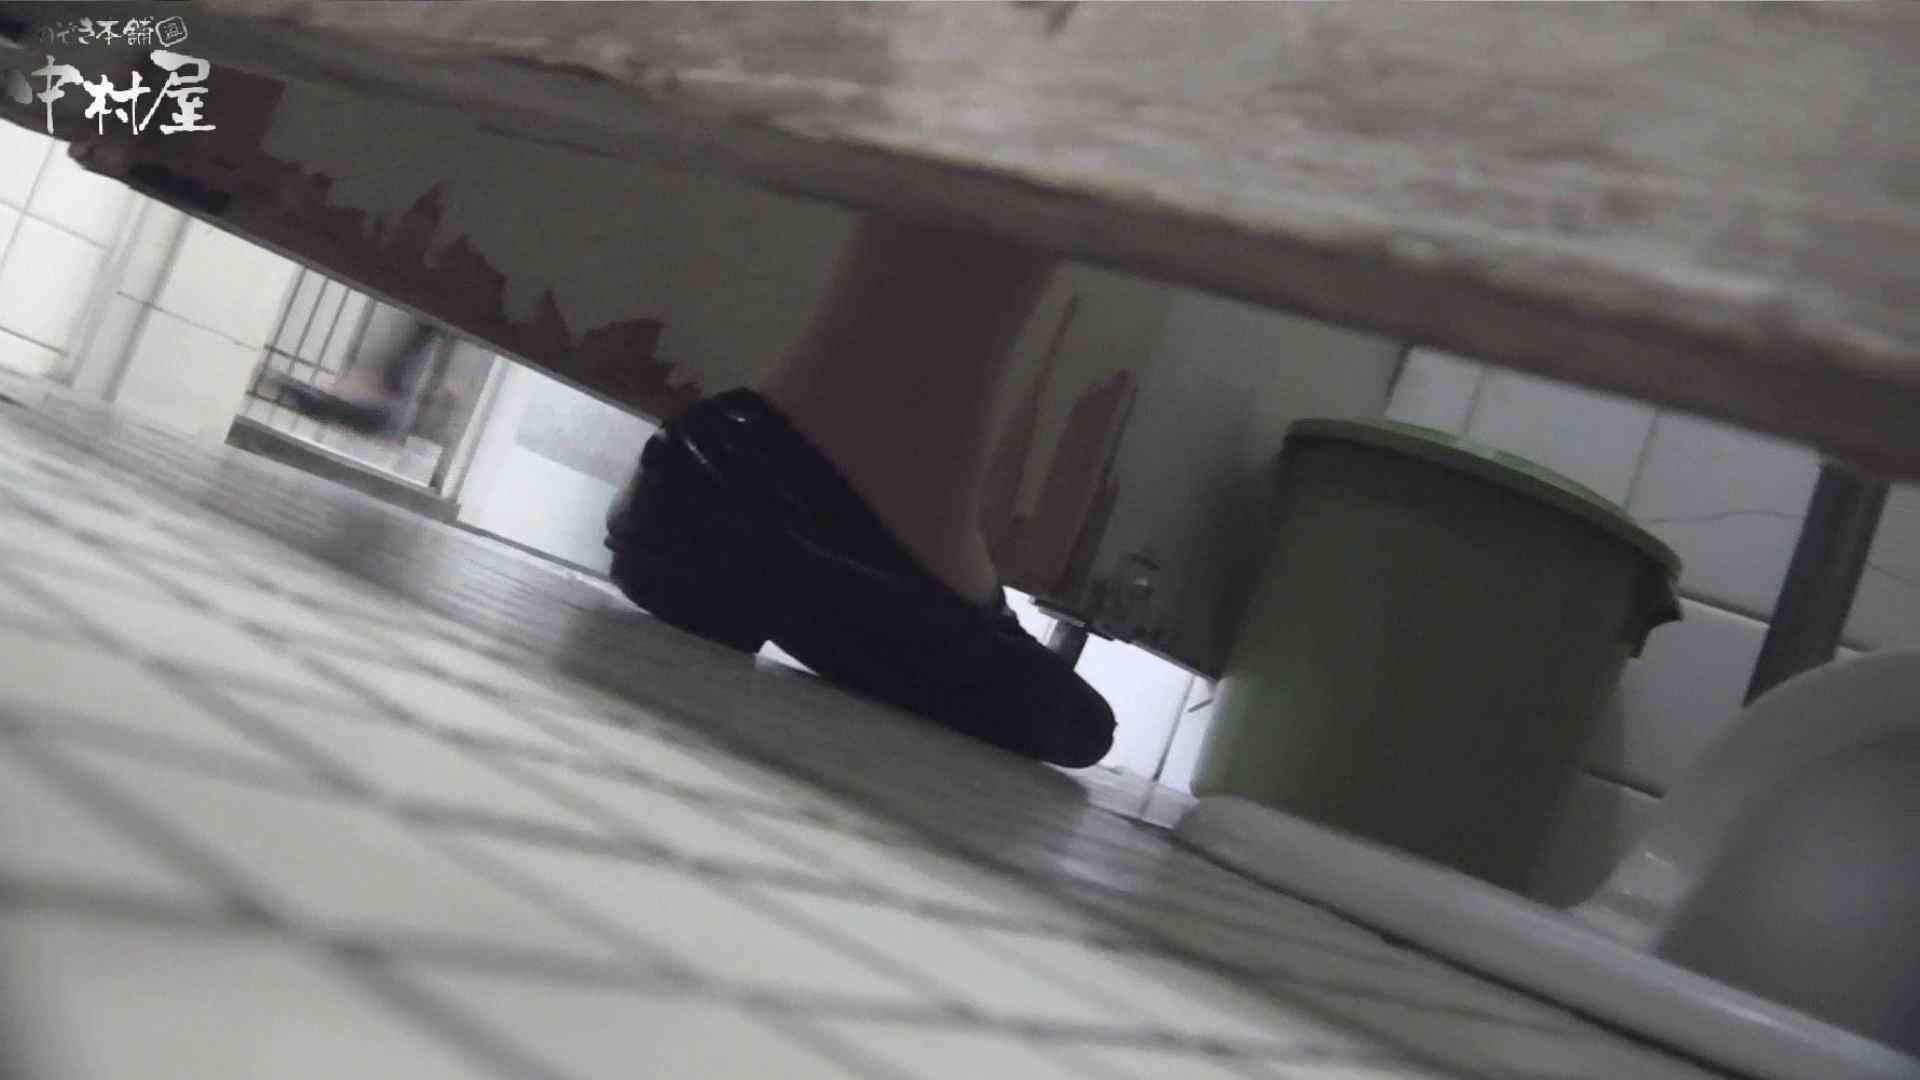 vol.42 命がけ潜伏洗面所! カカト上げながら・硬度強(太)・180g HなOL セックス無修正動画無料 79pic 26